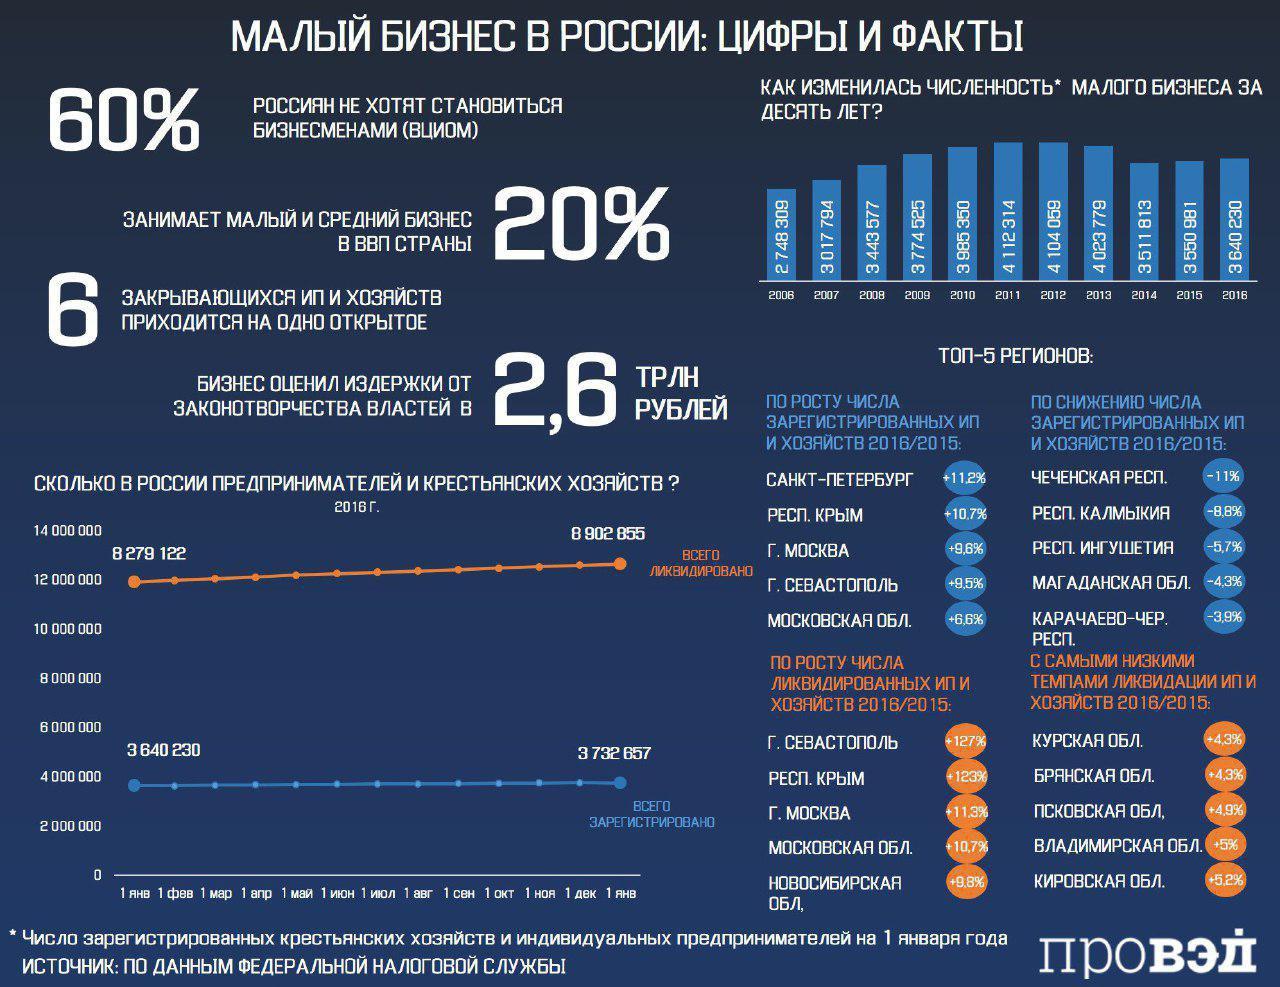 Бизнес в россии статистика